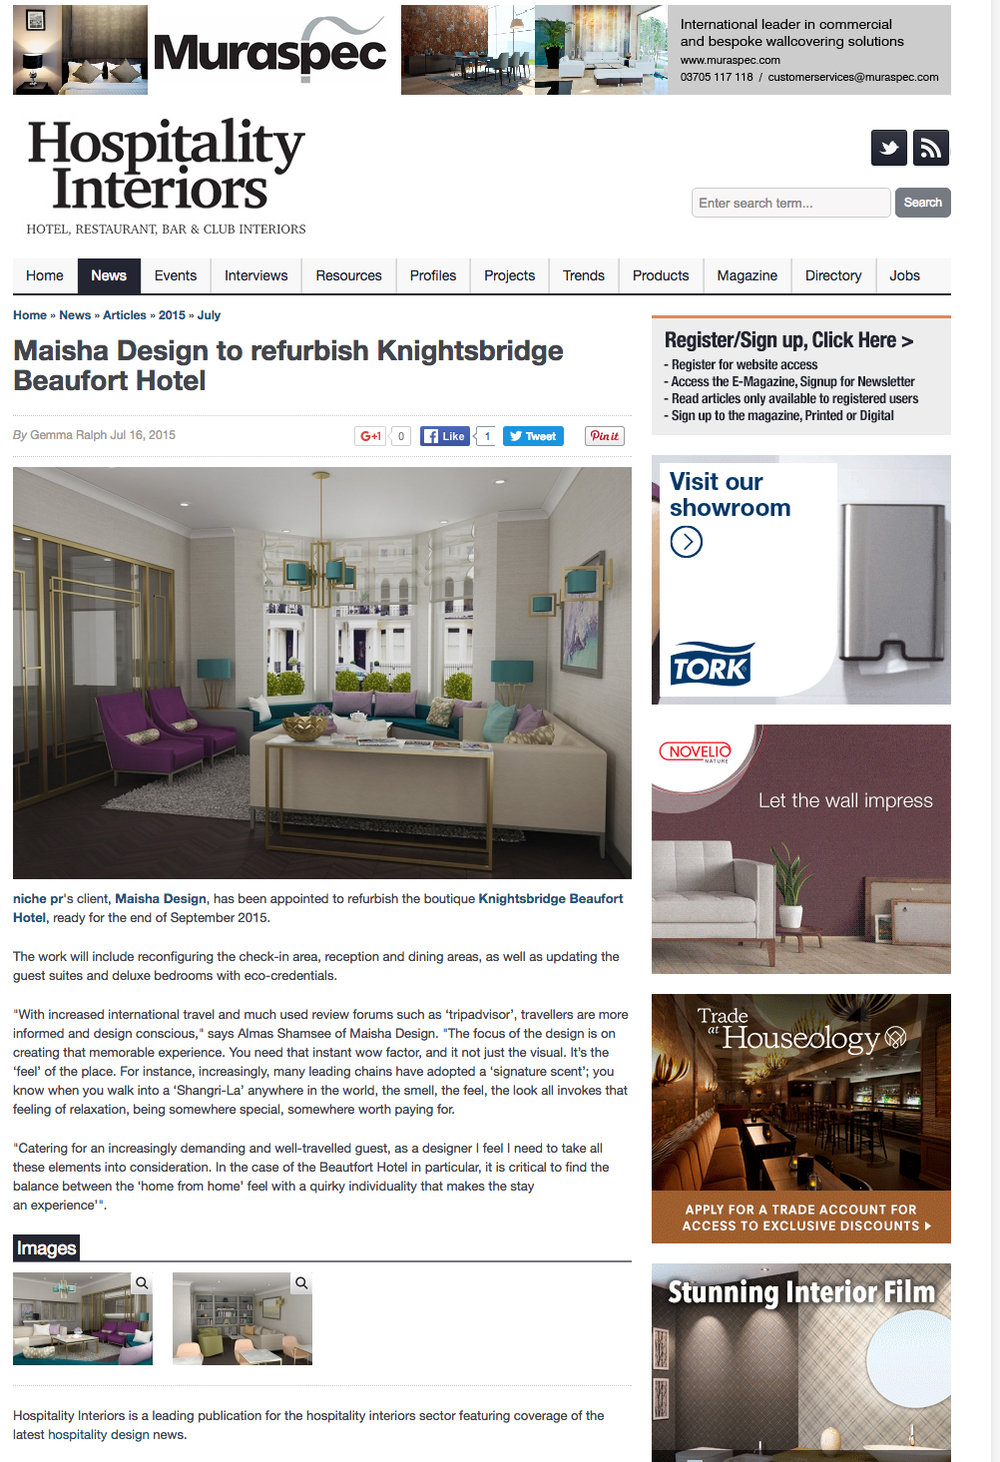 hospitality-interiors-cover.jpg